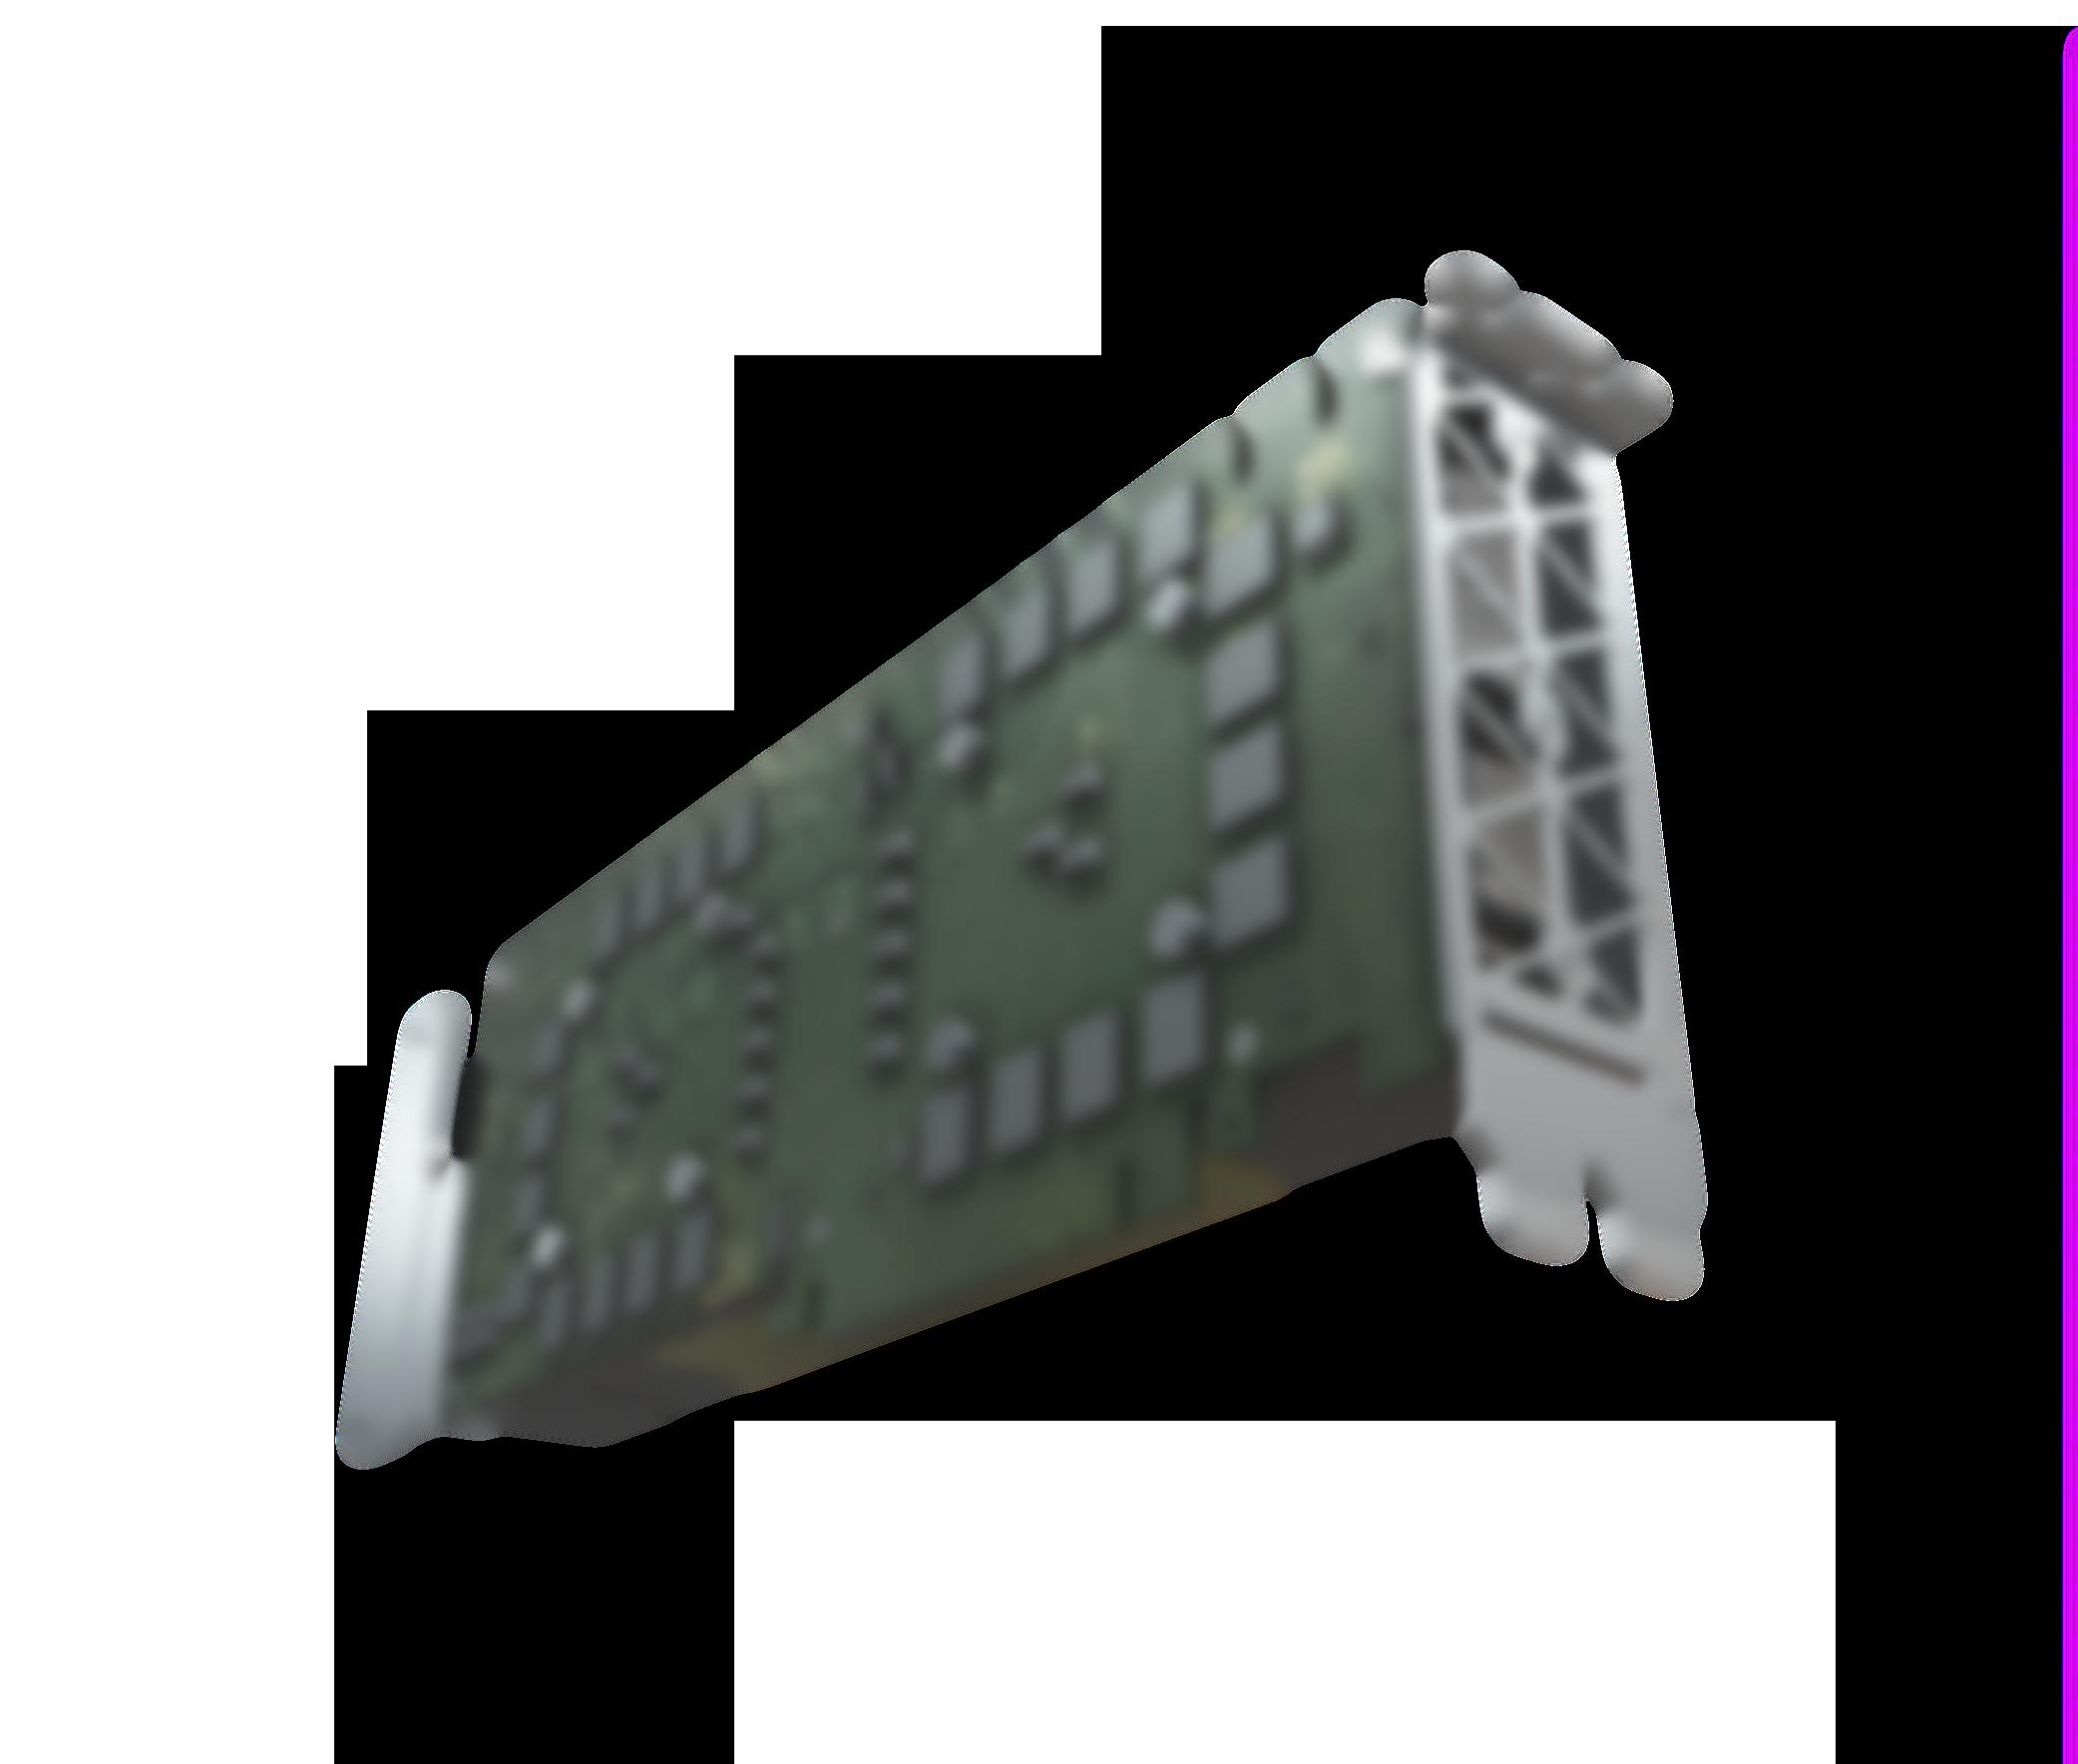 Skewed in perspective rendering of the NVIDIA Tesla computer board.